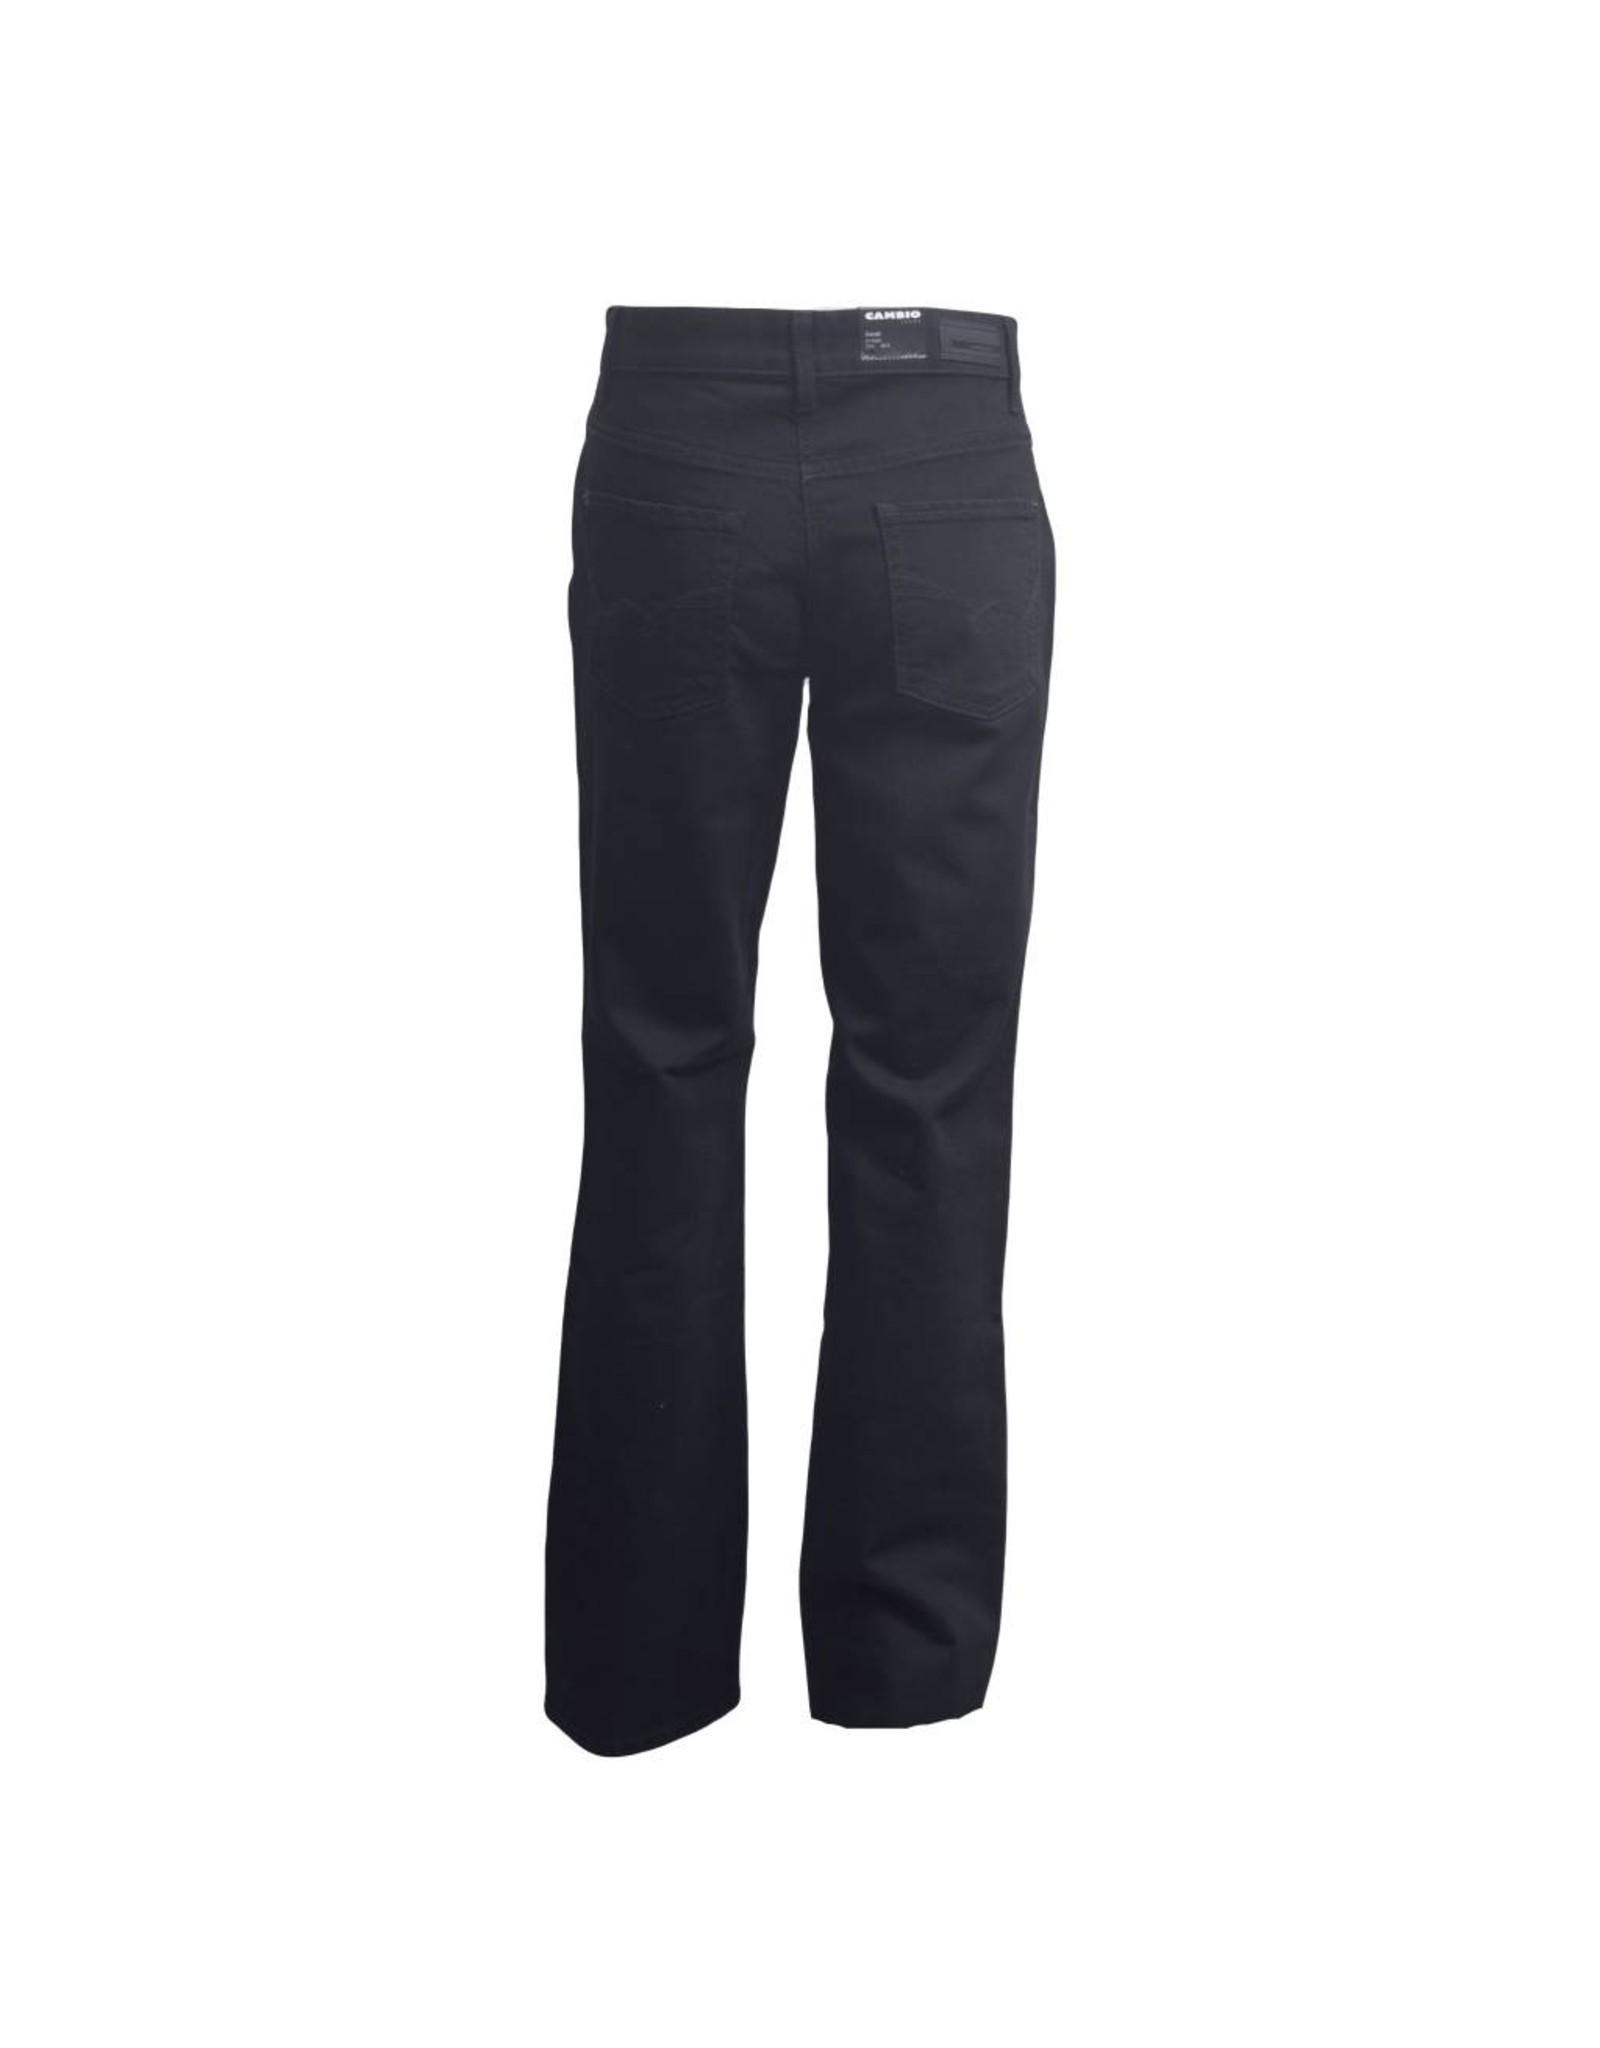 Cambio Cambio Norah Straight Jeans - Black